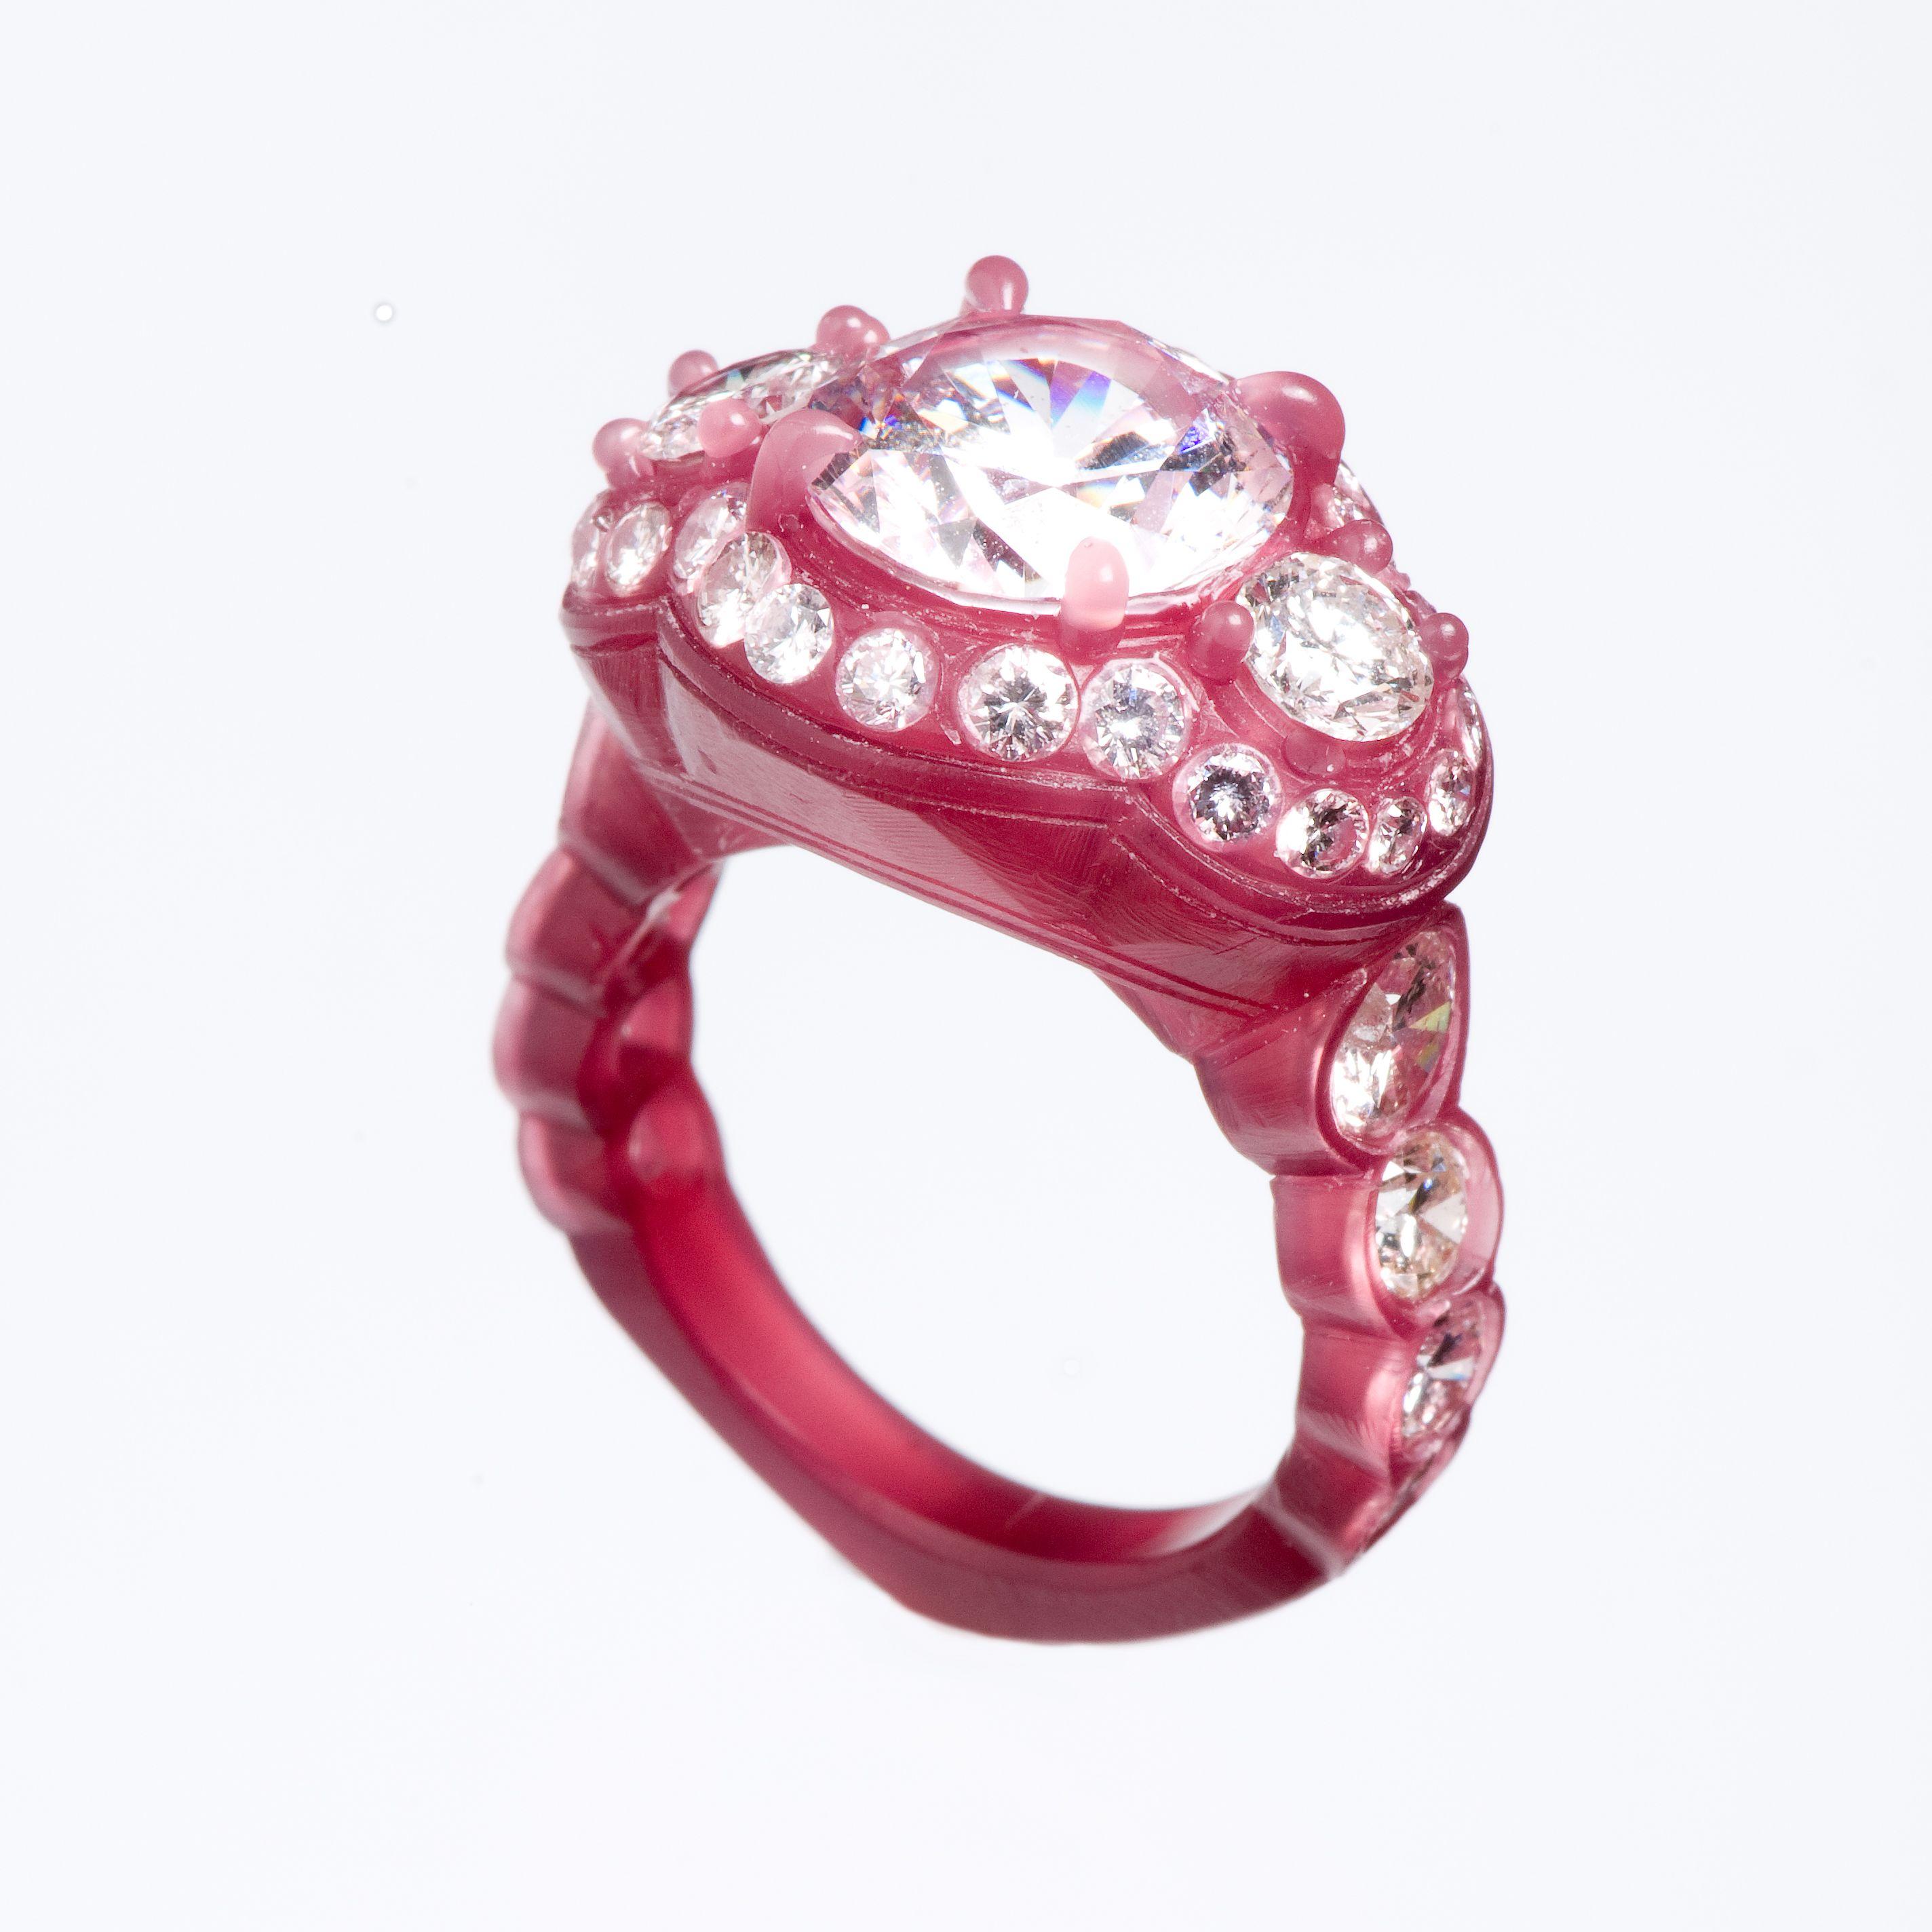 JPratt Designs: Custom carved wedding ring with a round center ...